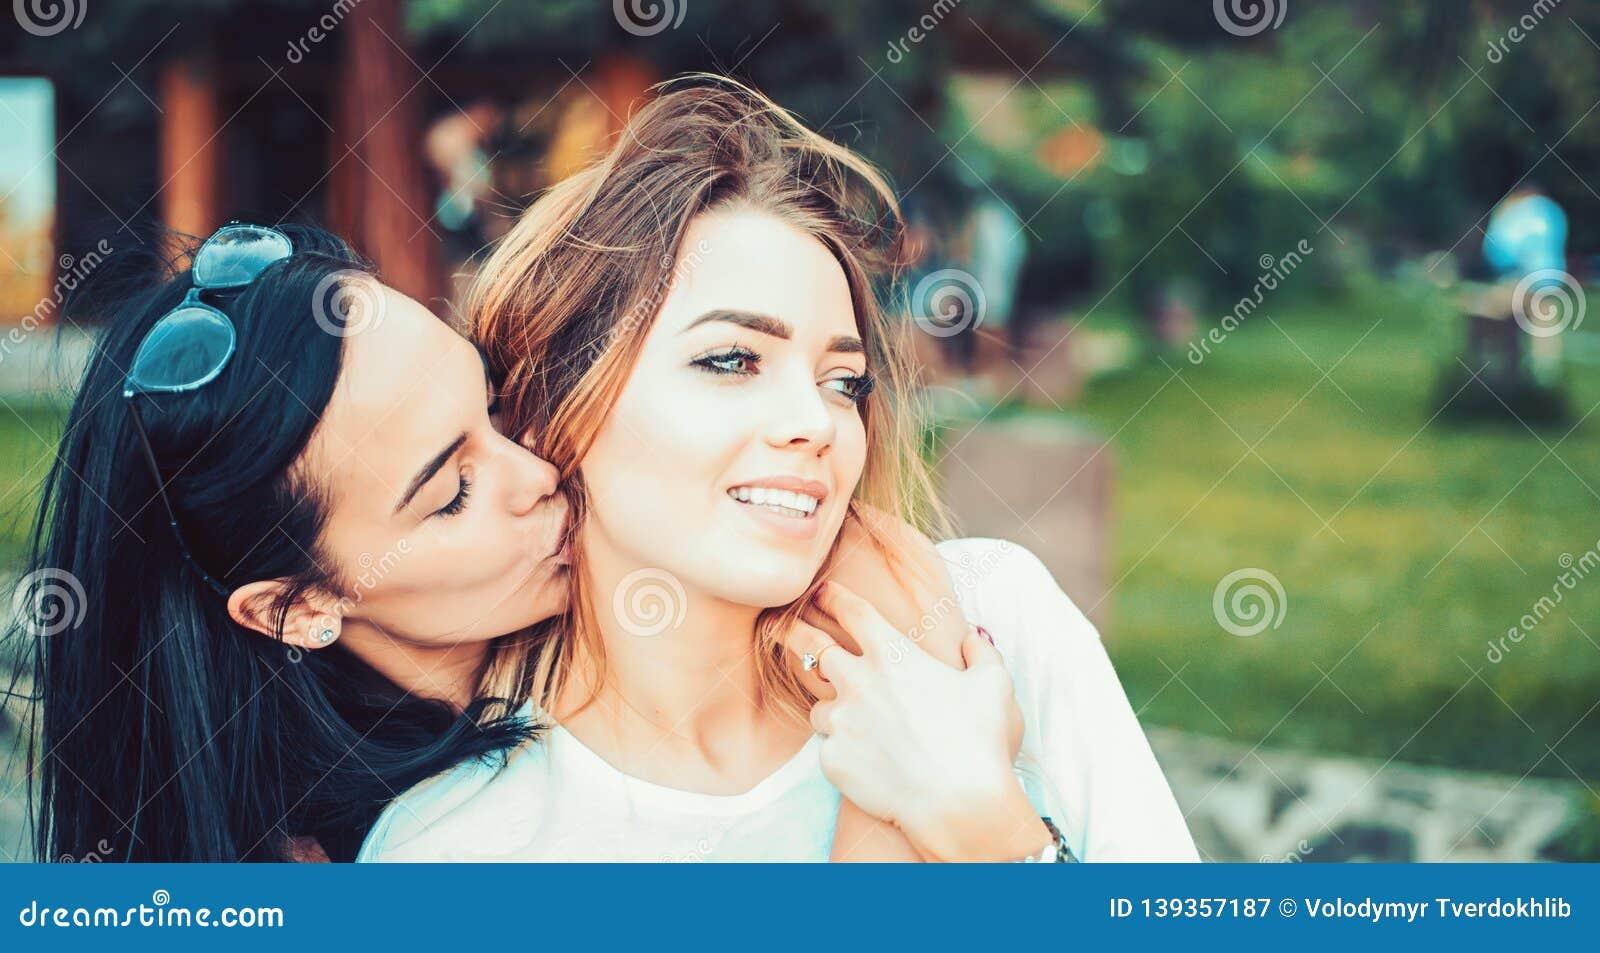 Lesbian couple love